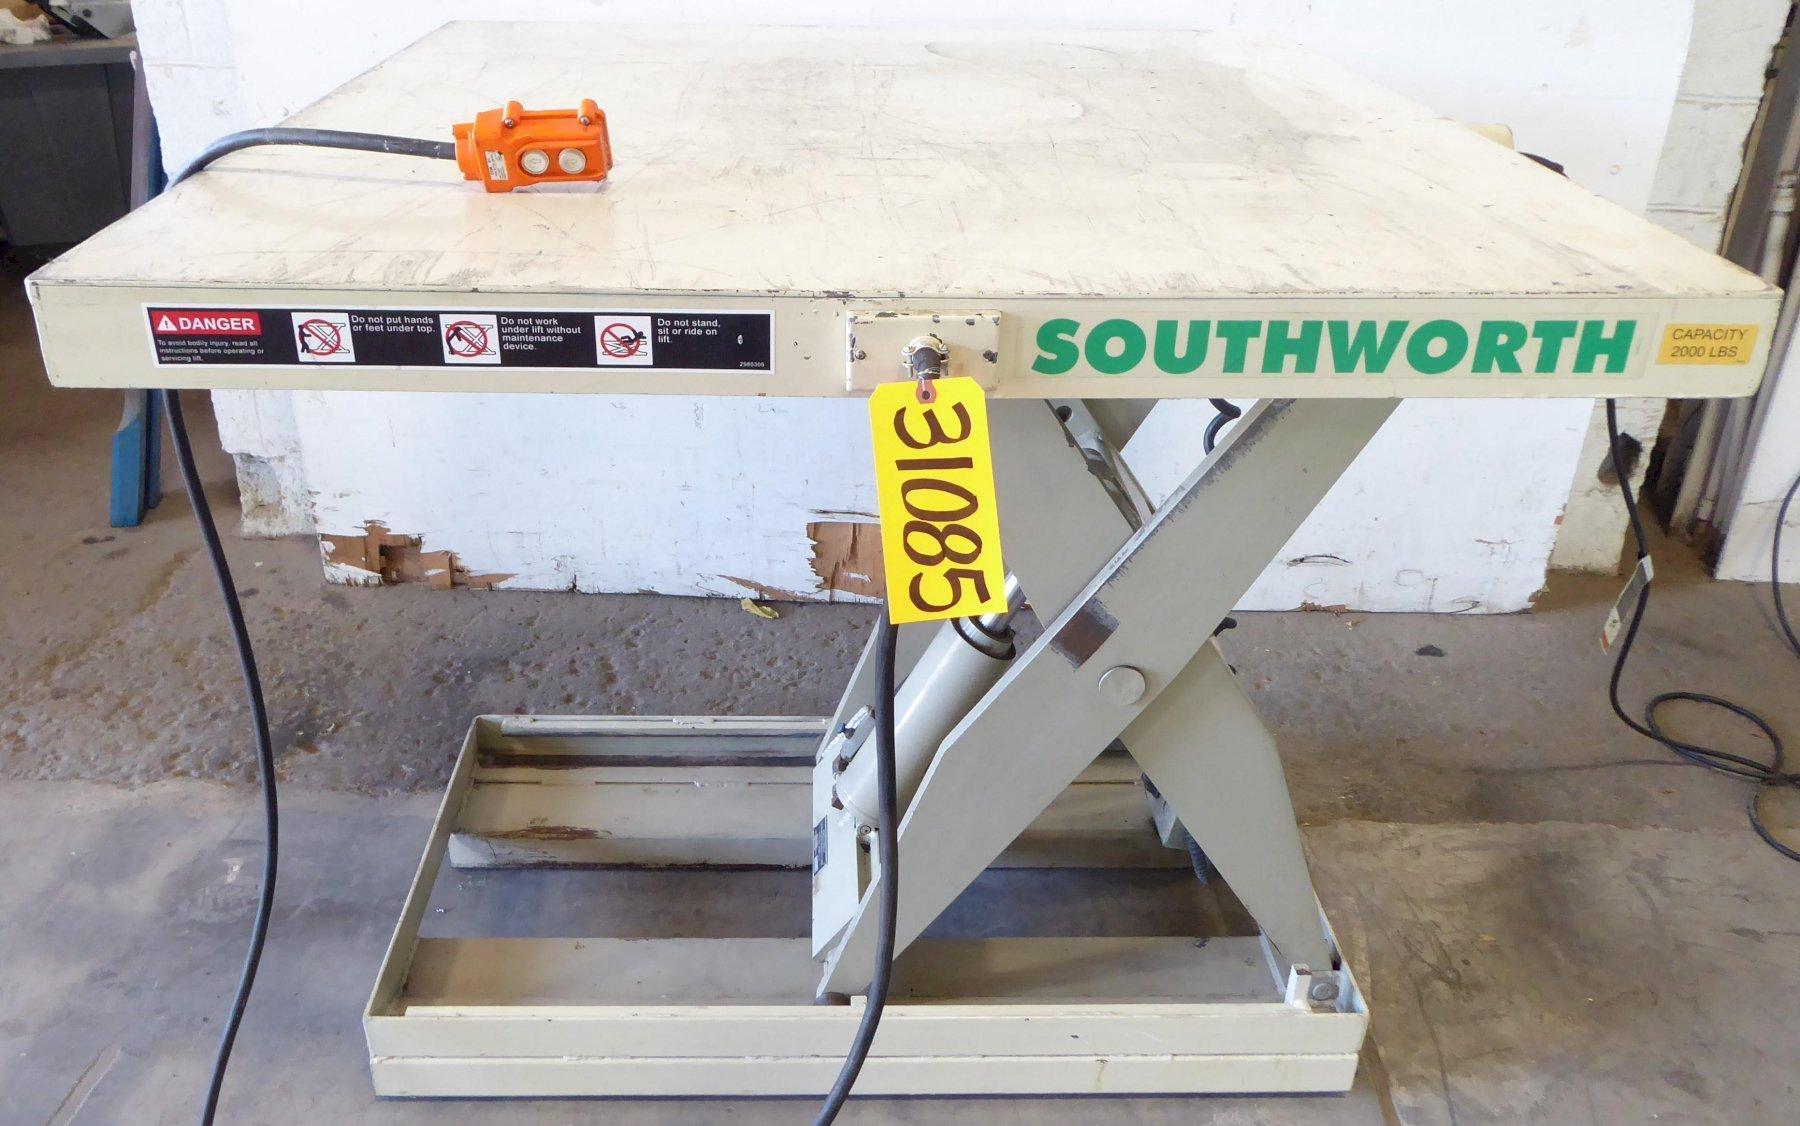 2000 Lb. SOUTHWORTH Lift Table, 48″ x 48″ Platform, 10″ Lowered, 46″ Raised, 1 Phase